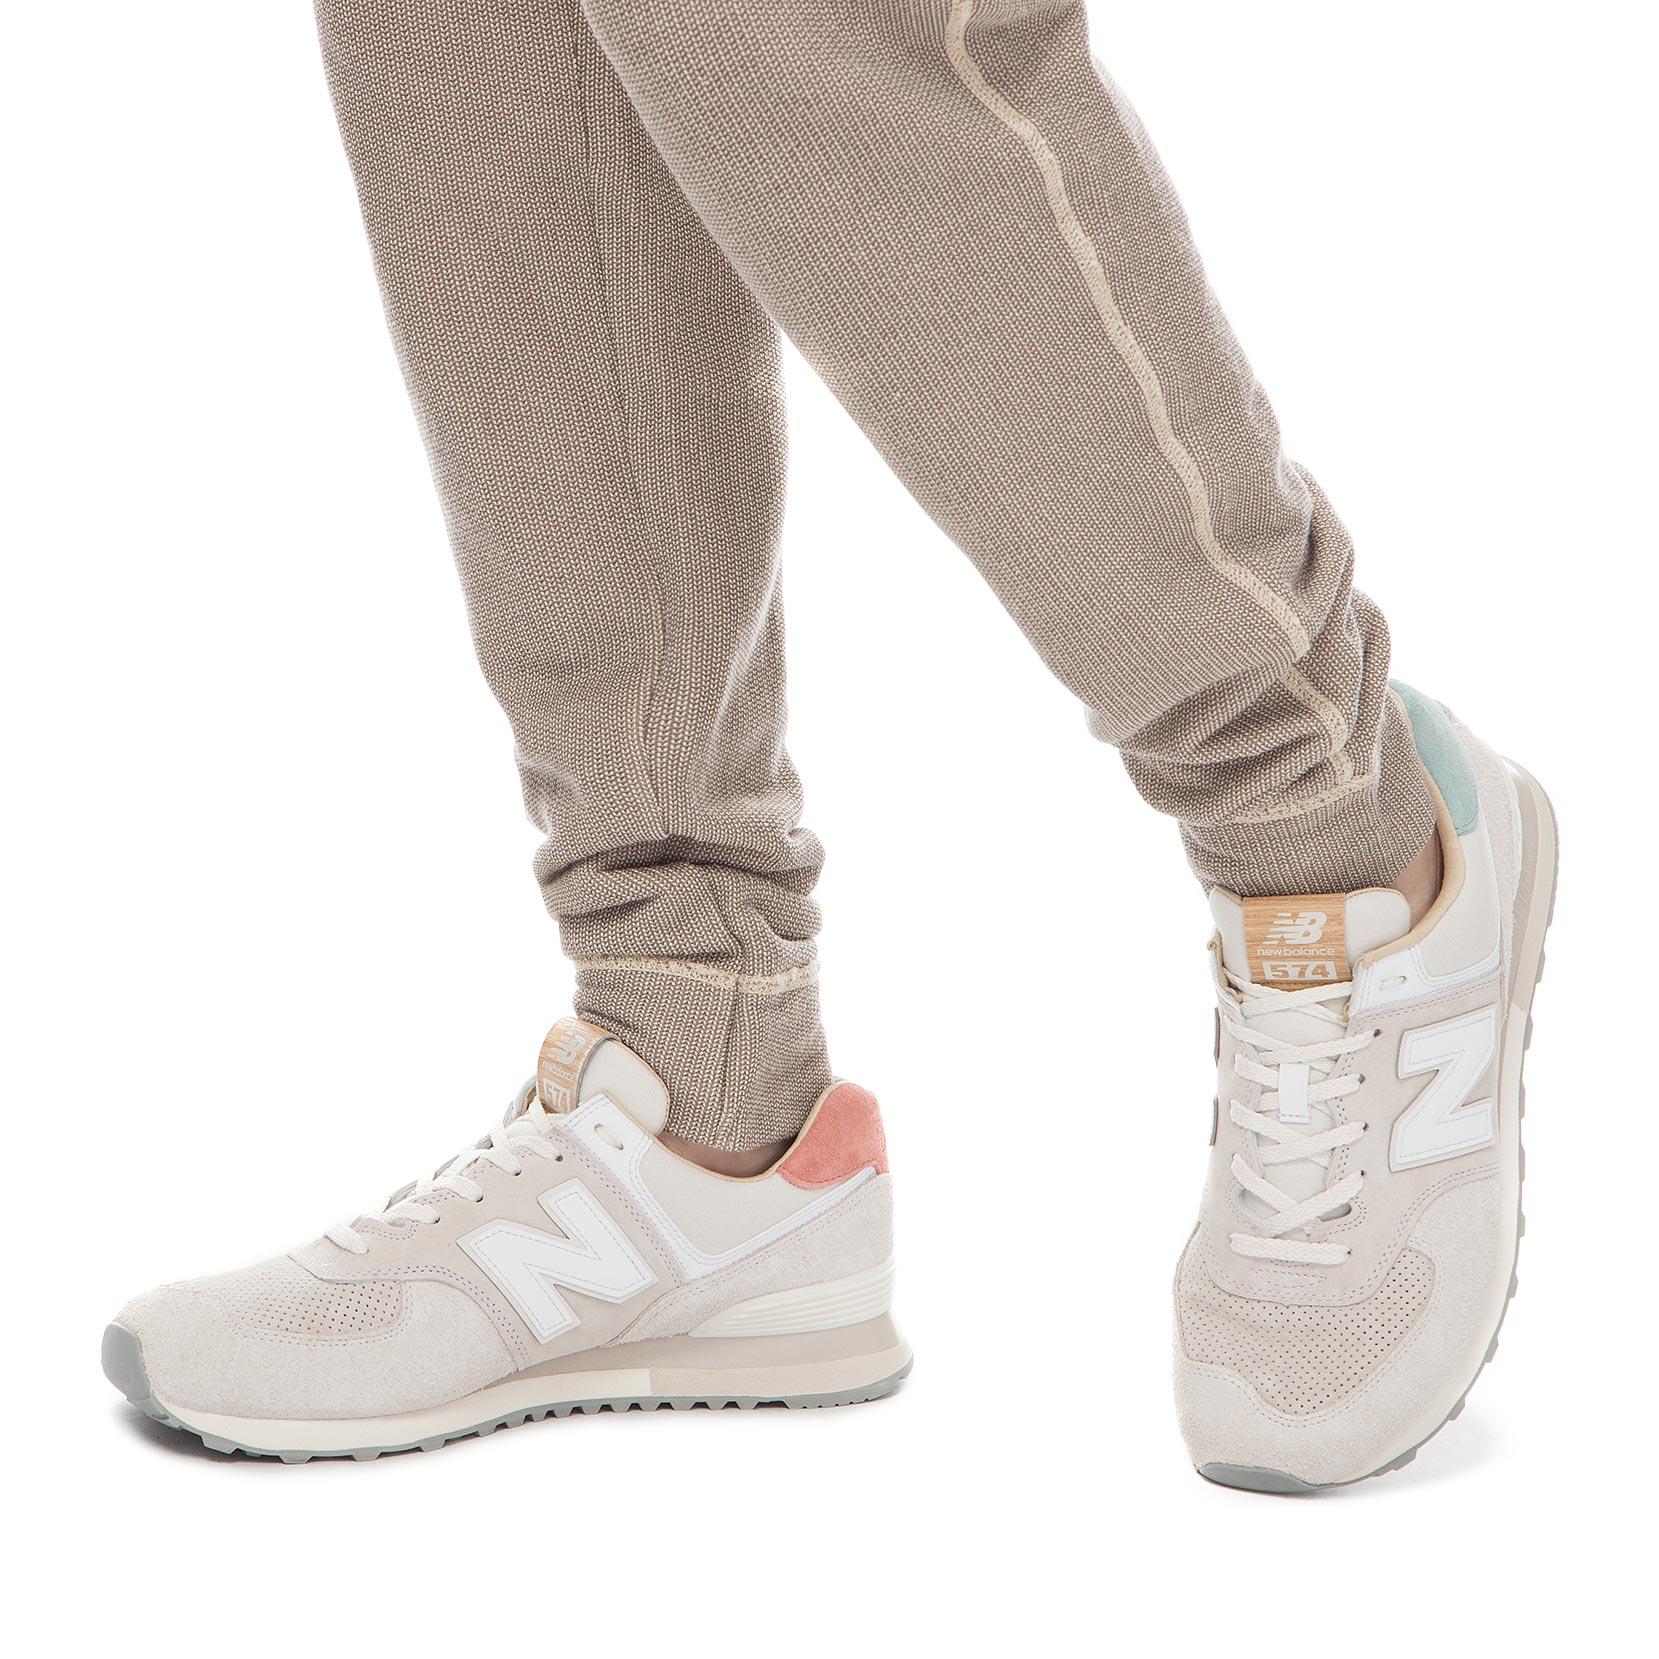 outlet store 837c3 64b89 Чоловіче взуття повсякденне New Balance 574 ML574OR | New ...